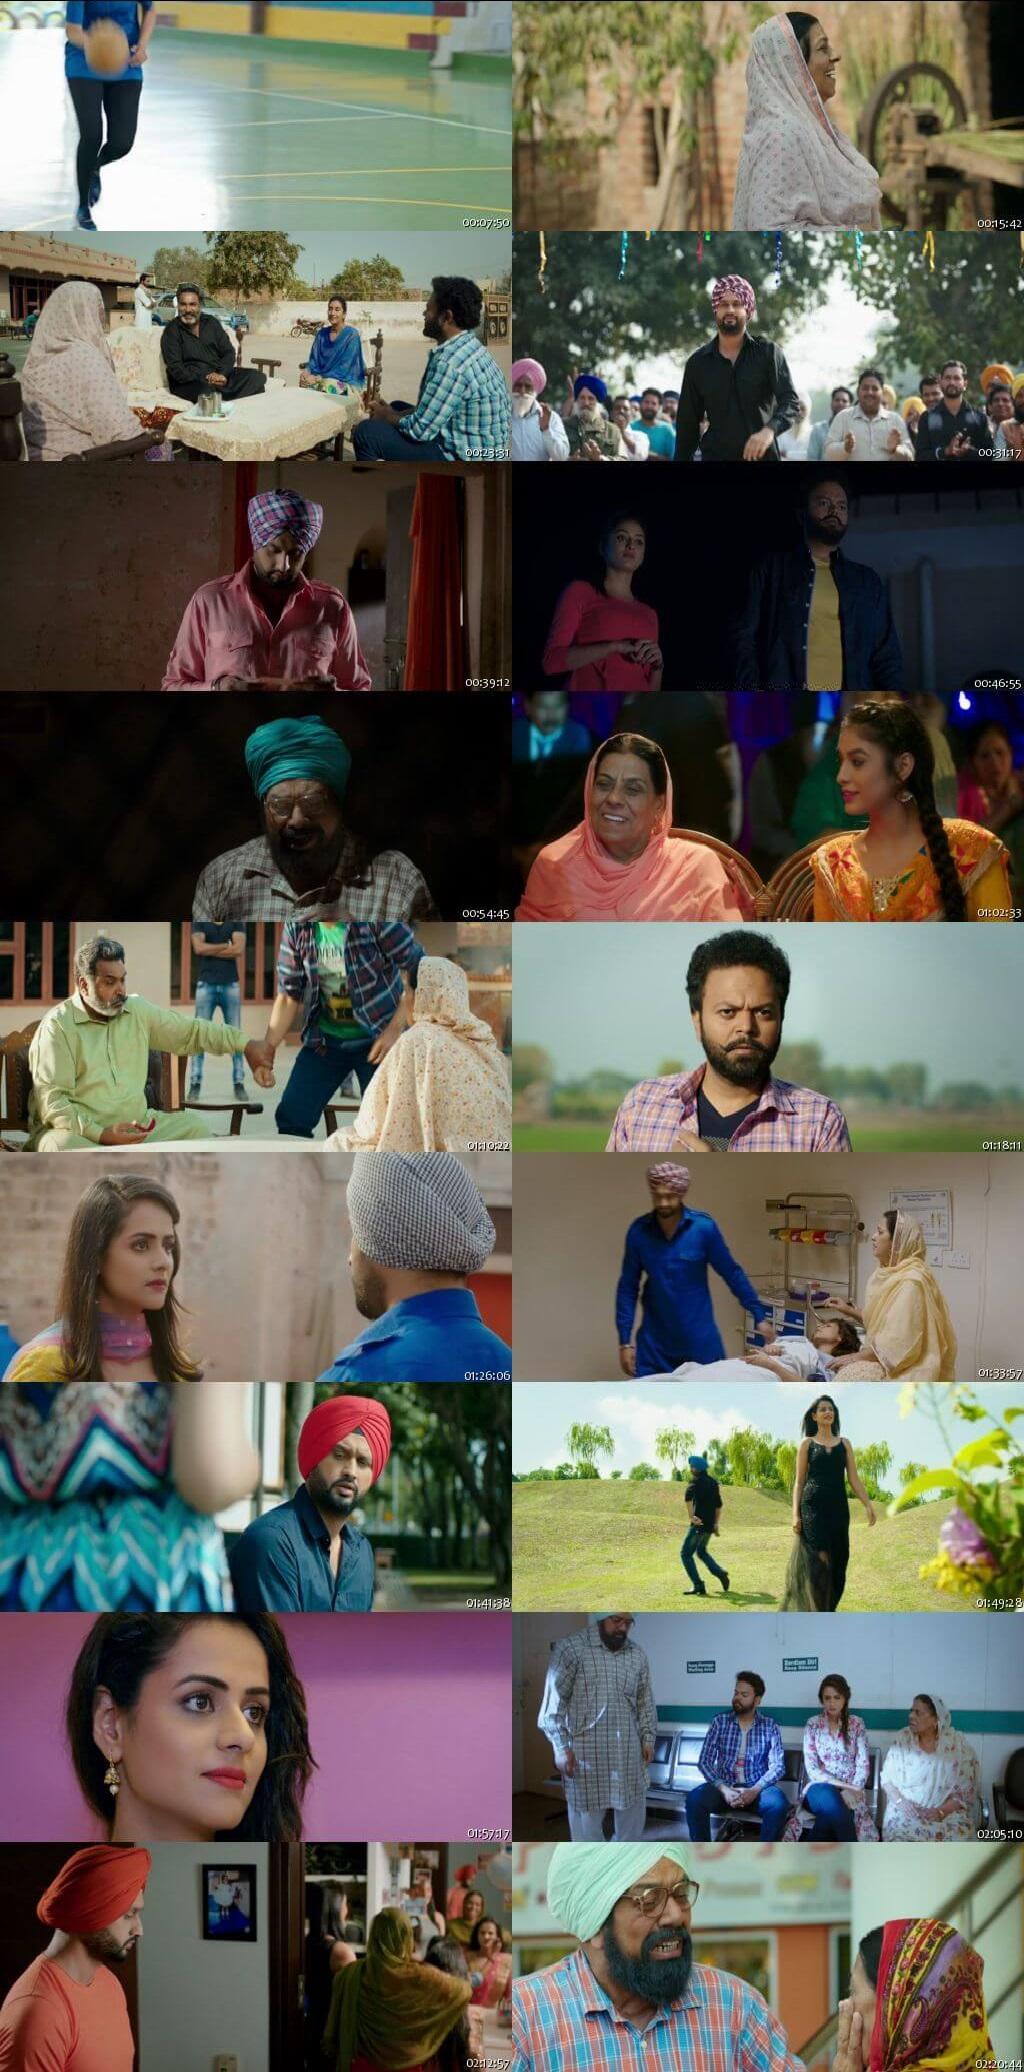 Arjan%2B%25282017%2529%2B1.14GB%2B720P%2BHDRip%2BPunjabi%2BMovie%2BESubs Arjan 2017 Full Punjabi Movie Free Download 720P HD HEVC